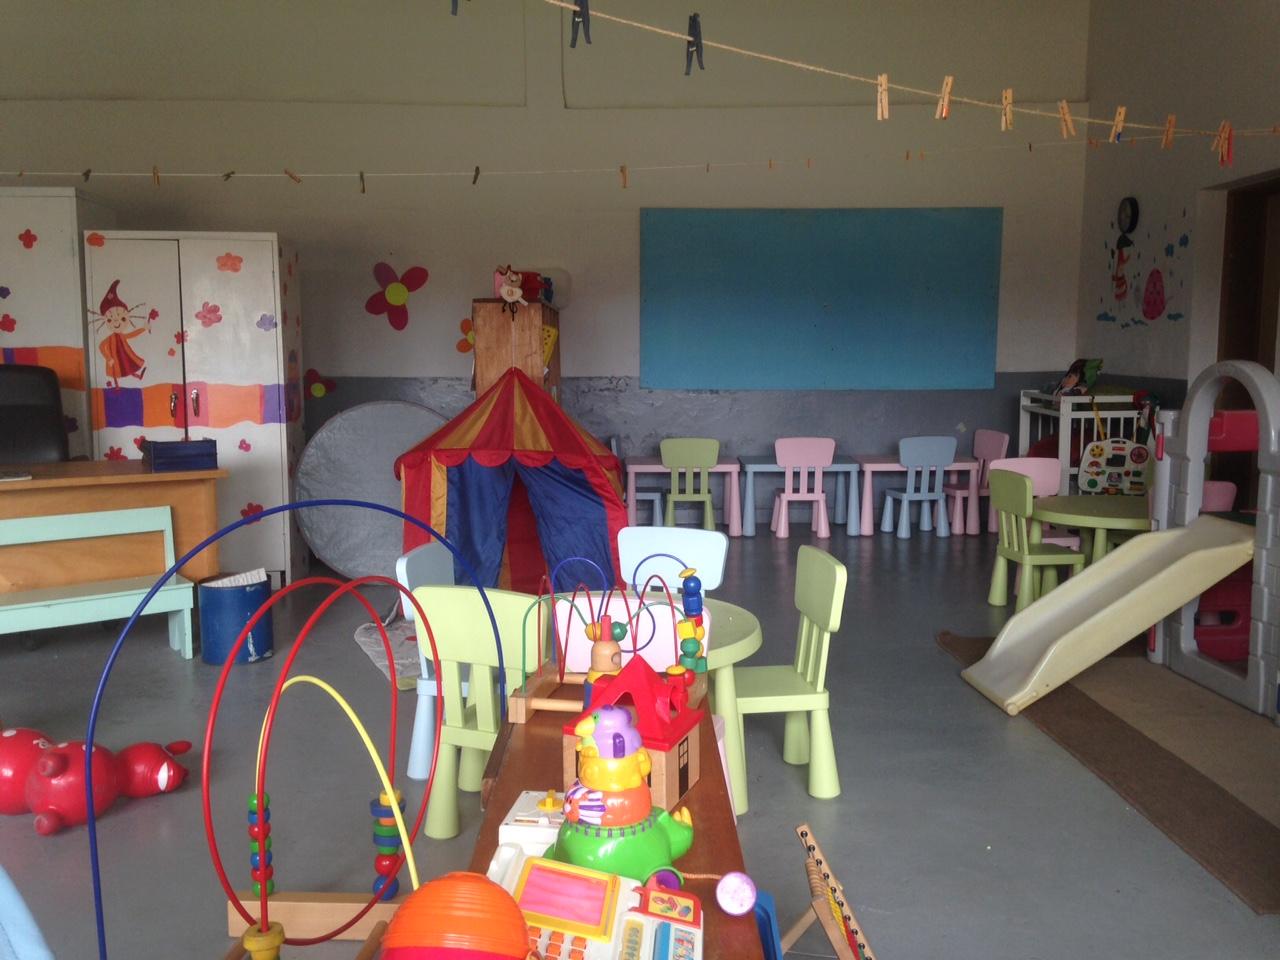 kinder garden crche prince de liege belgium school - Kinder Garden